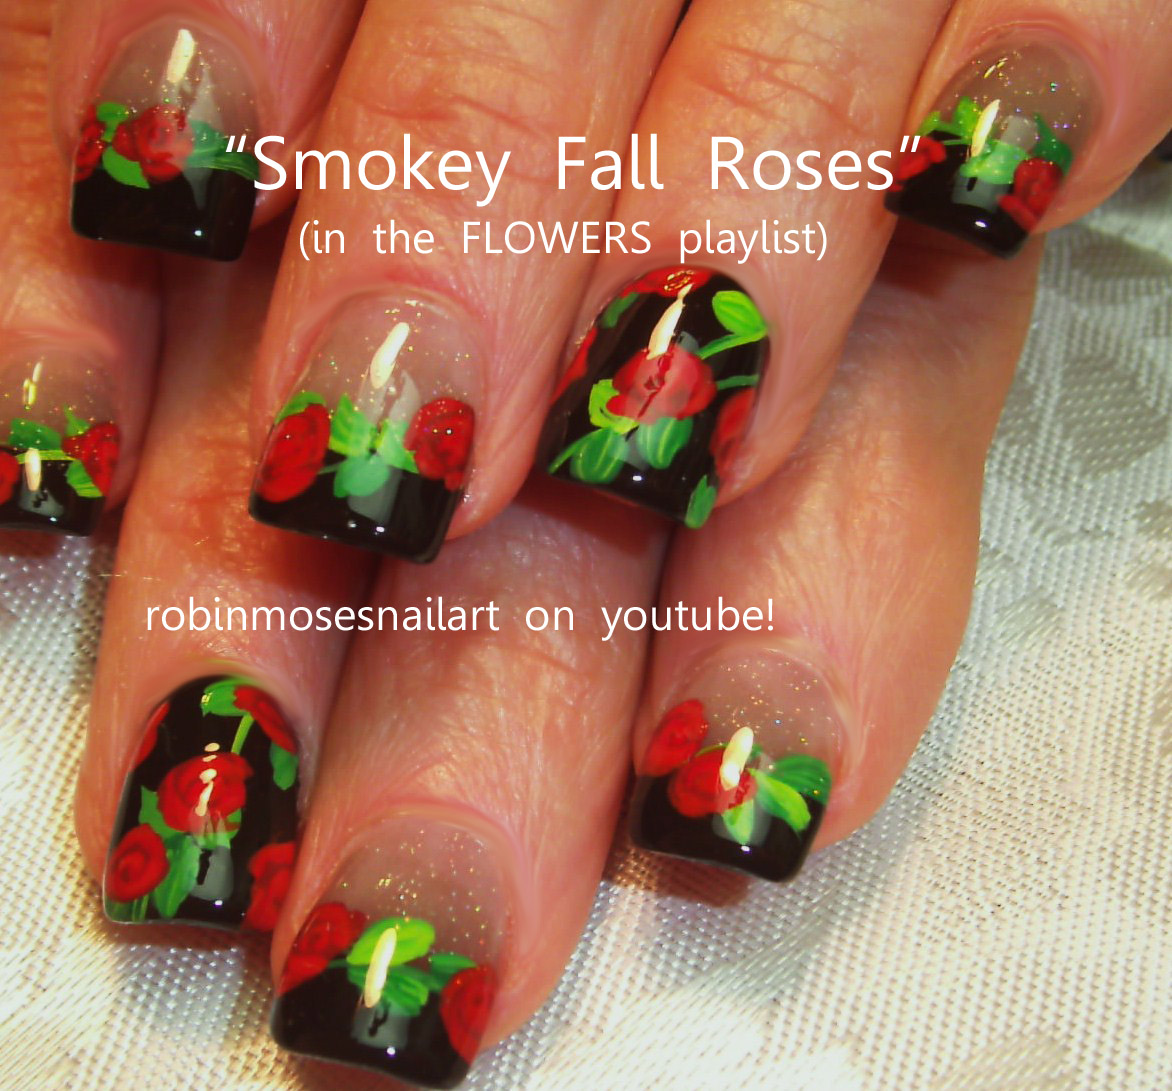 gargoyle nail art, red rose nail art, smokey grey nail art ...